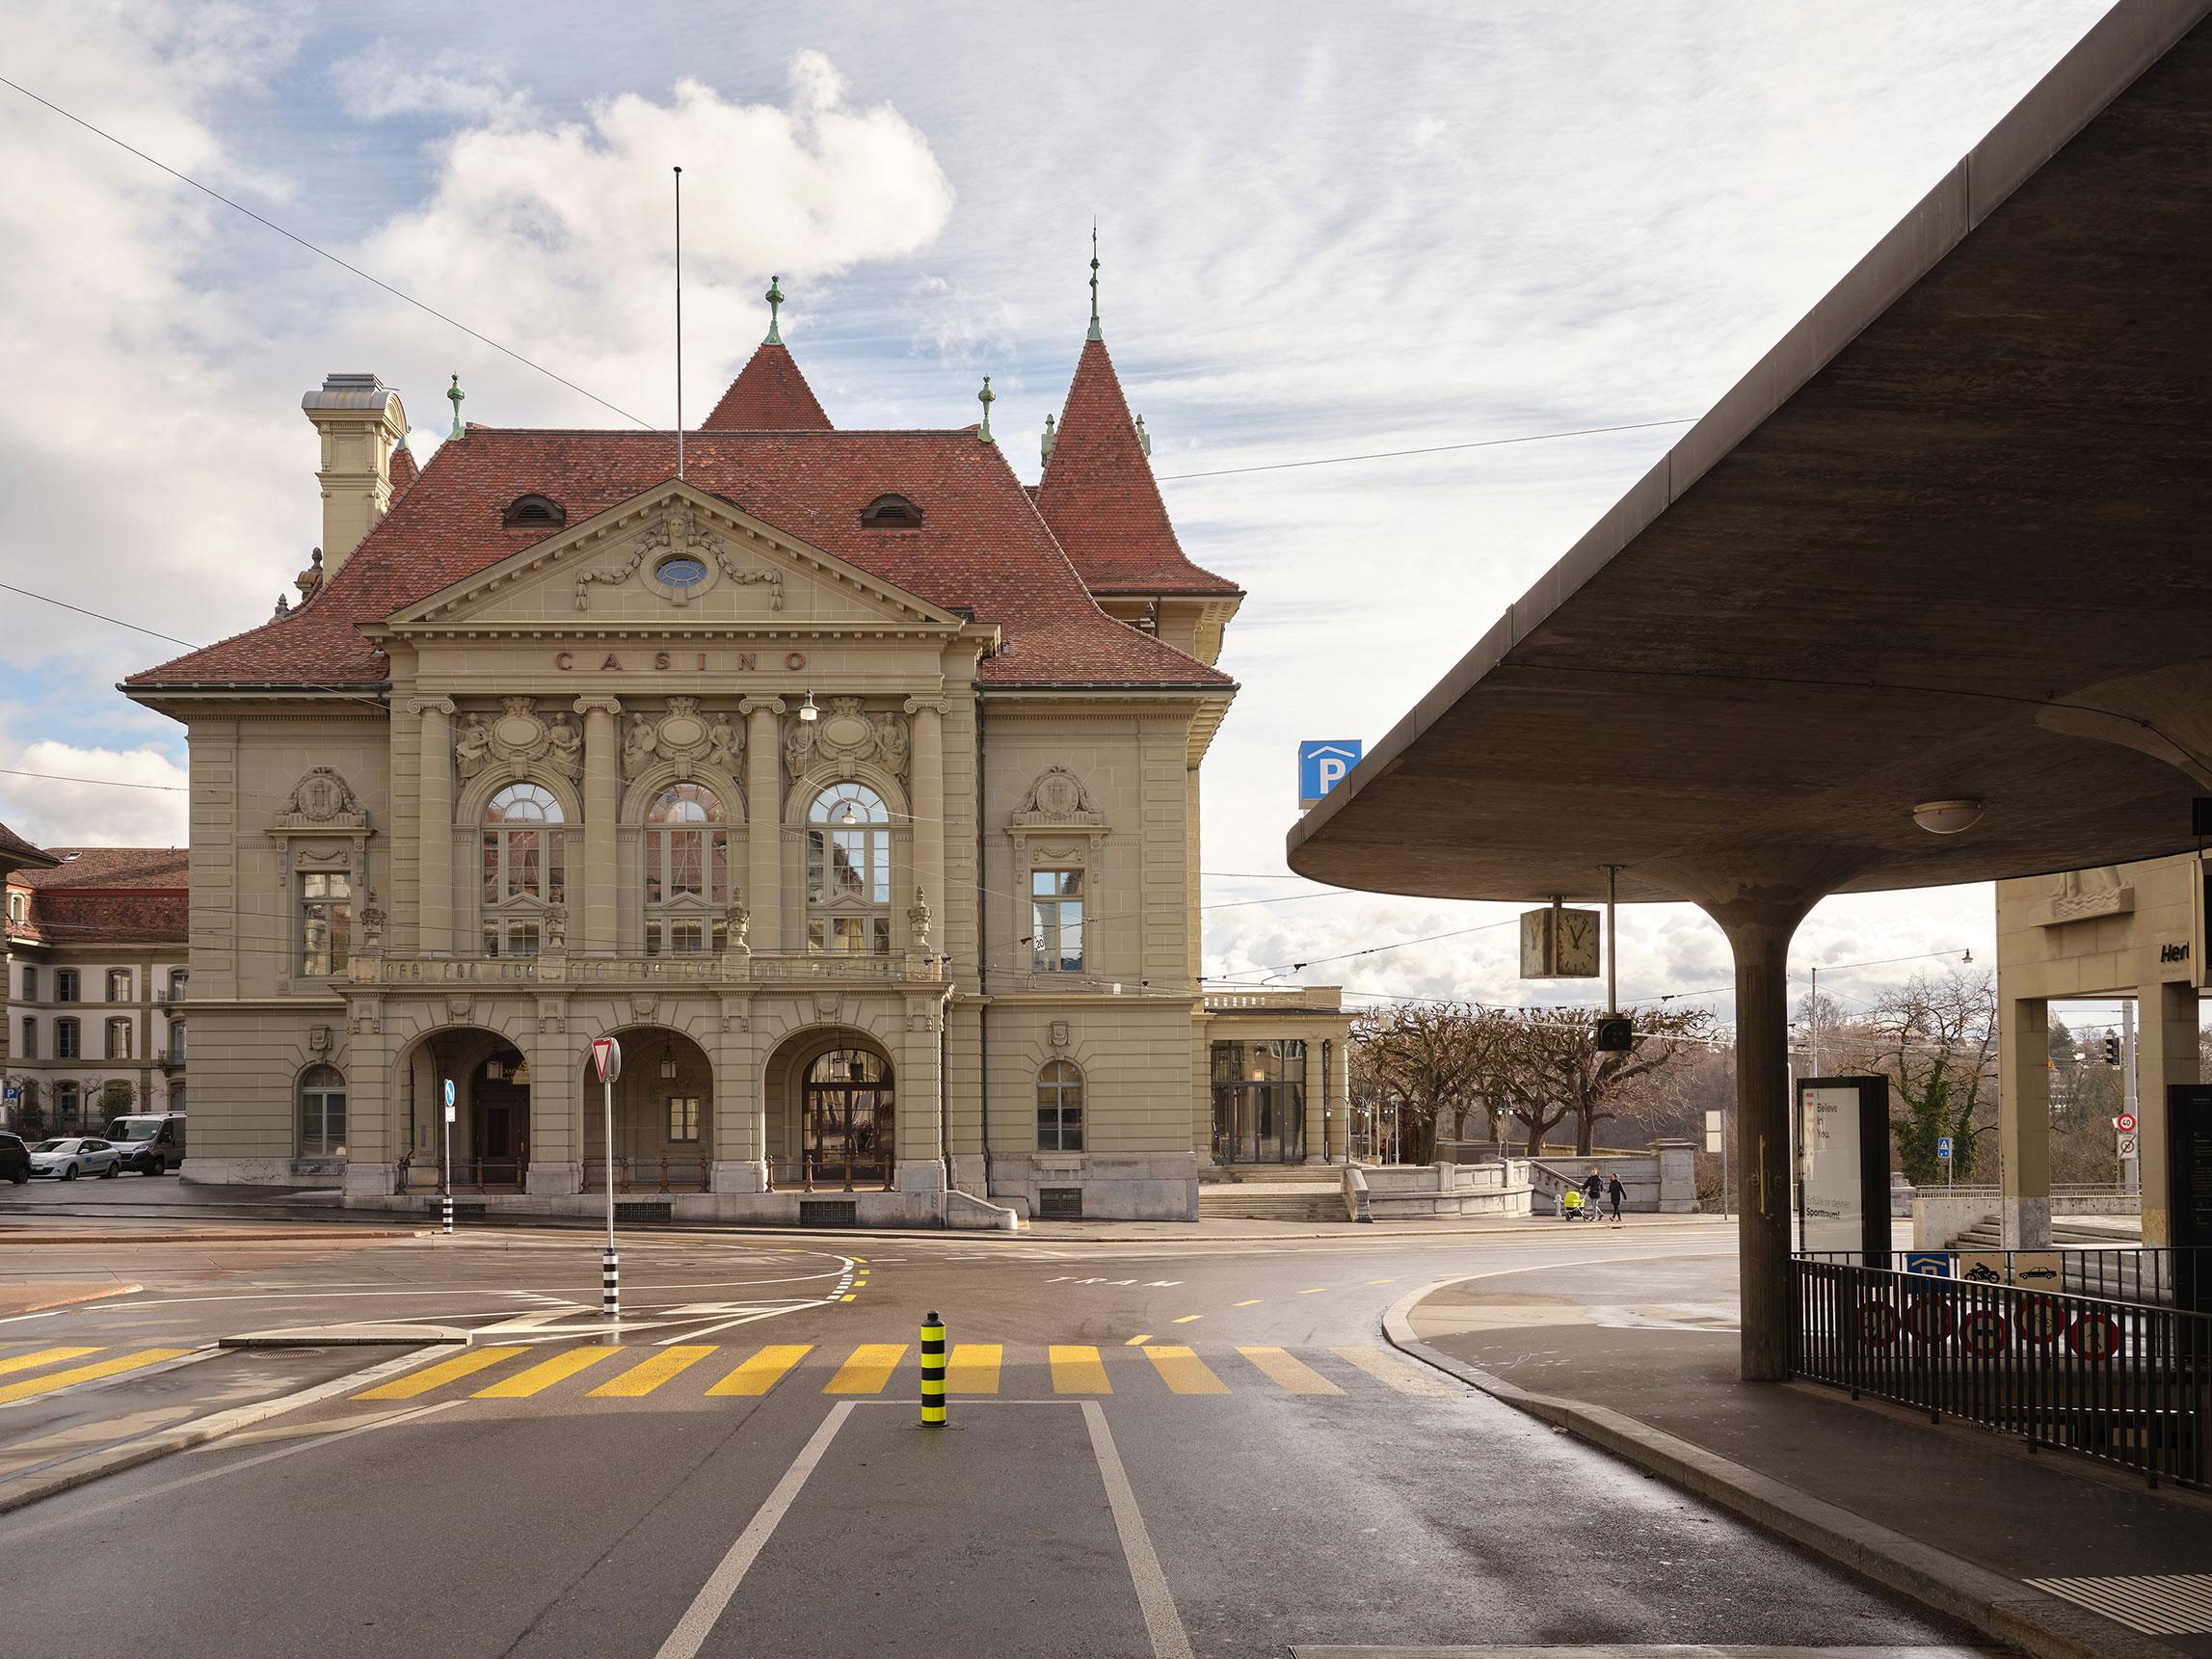 Nulleins Kommunikationsdesign Bern; Signaletik; 2016–2019, Casino Bern; Burgergemeinde; Fassade; Gebäudeanschrift; Casinoplatz 1; Kultur; Kulinarik; Events